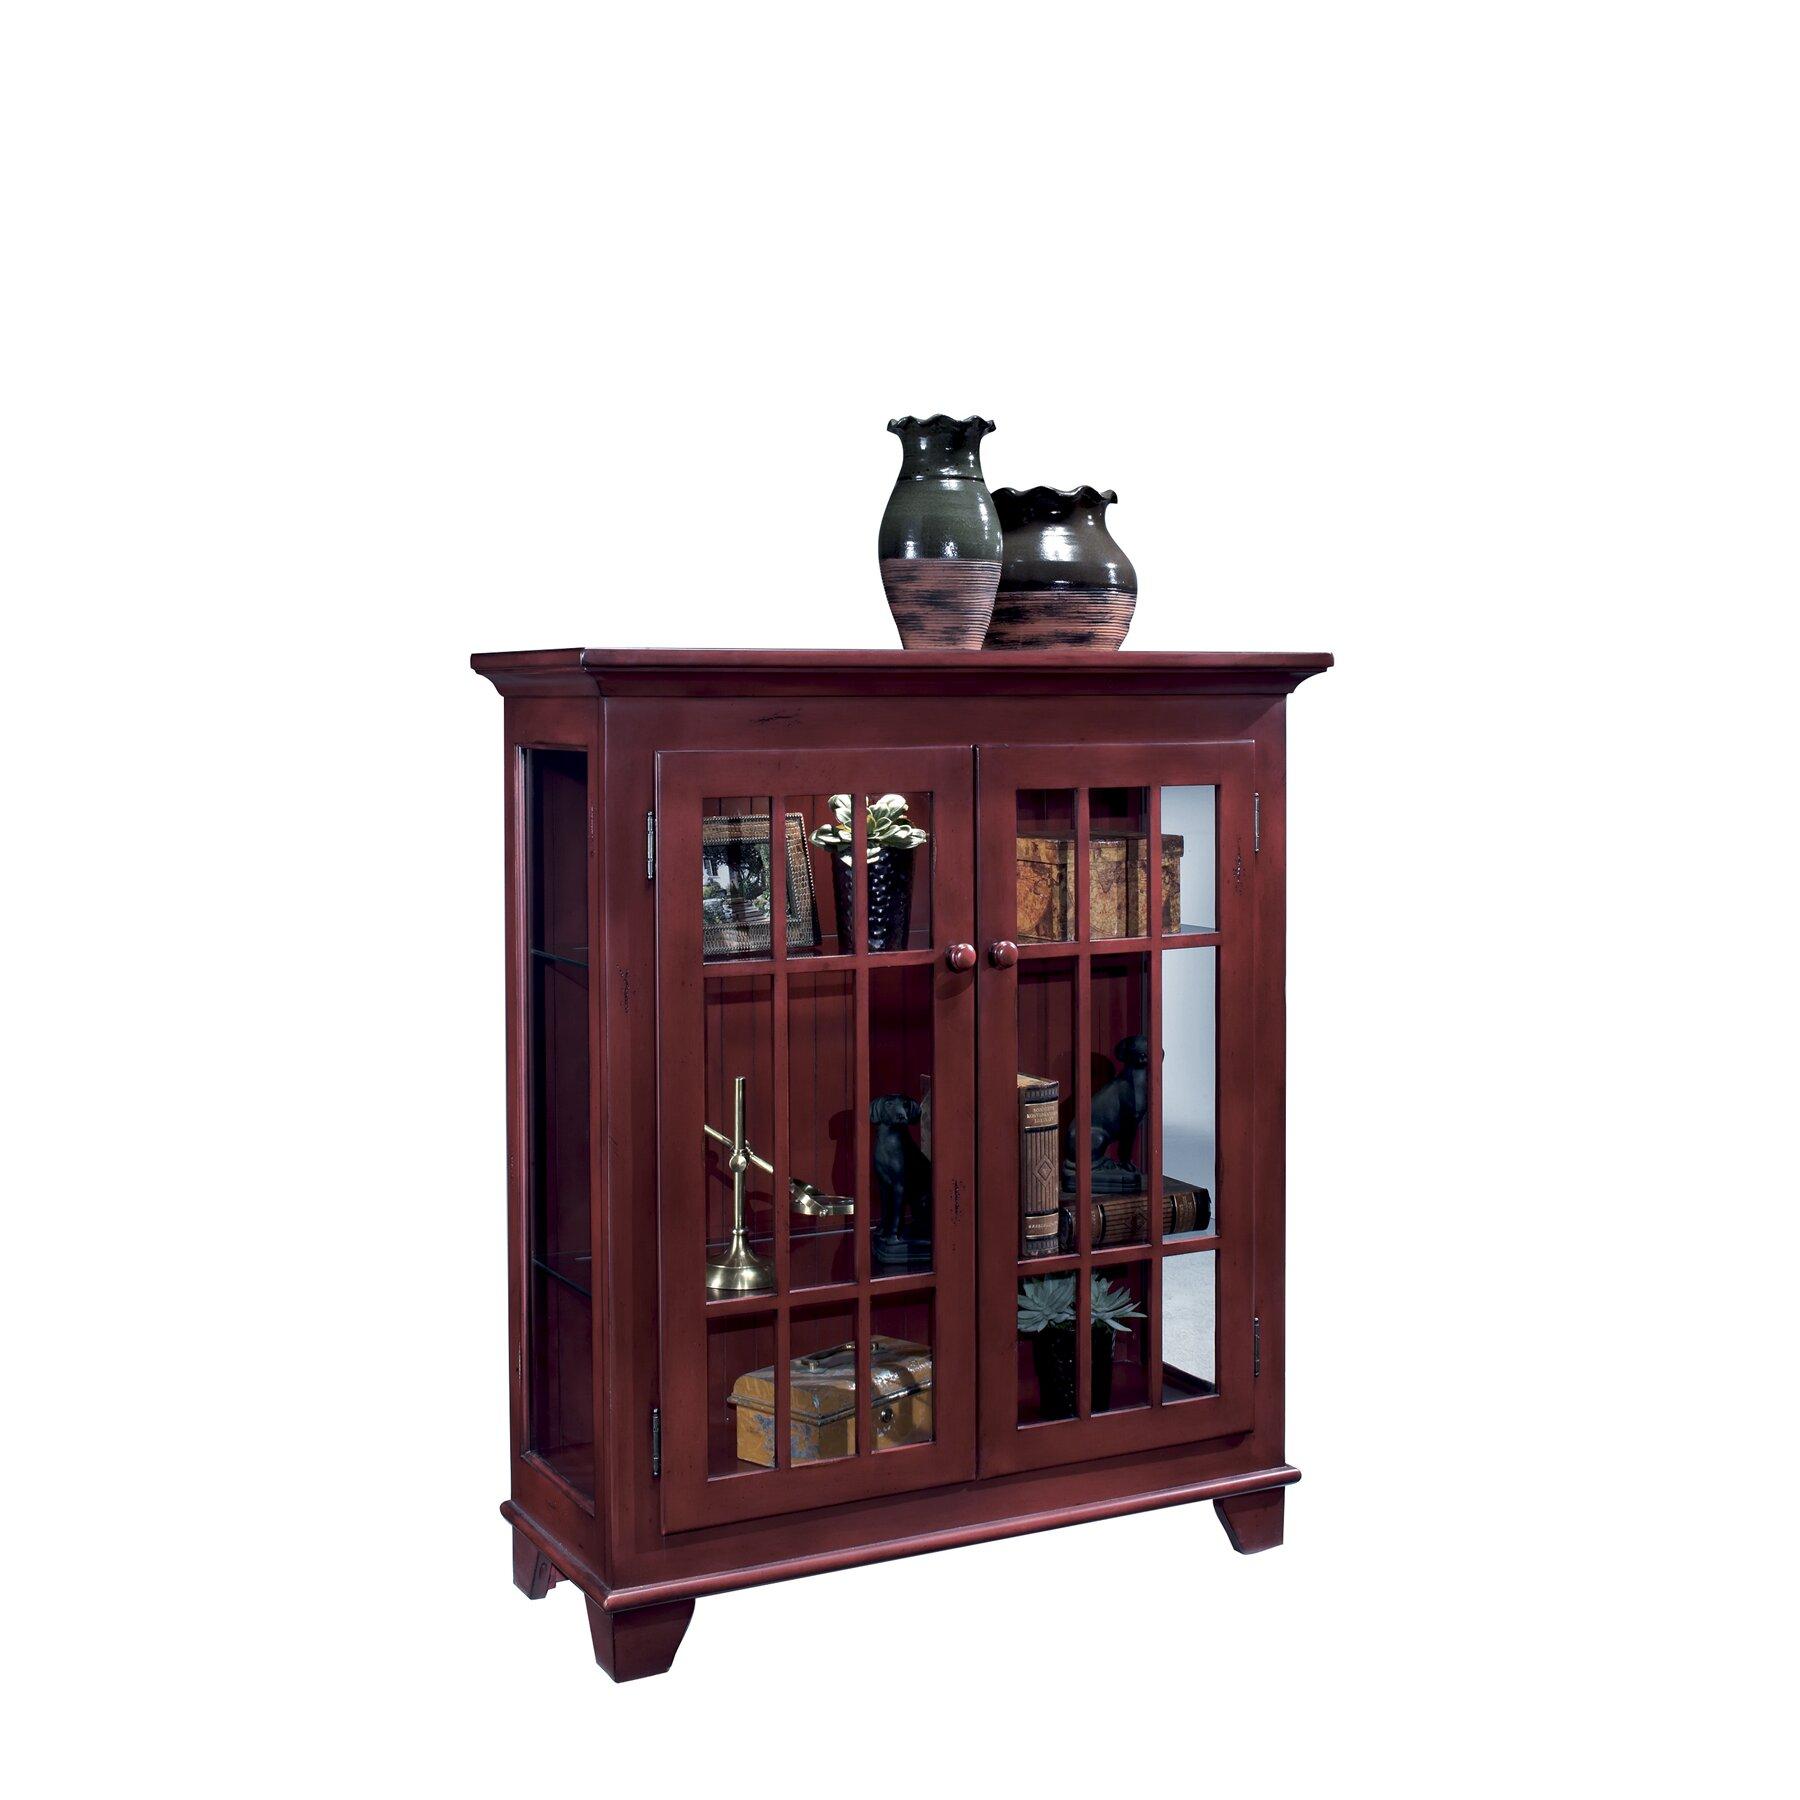 Philip reinisch co colortime barlow curio cabinet amp reviews wayfair